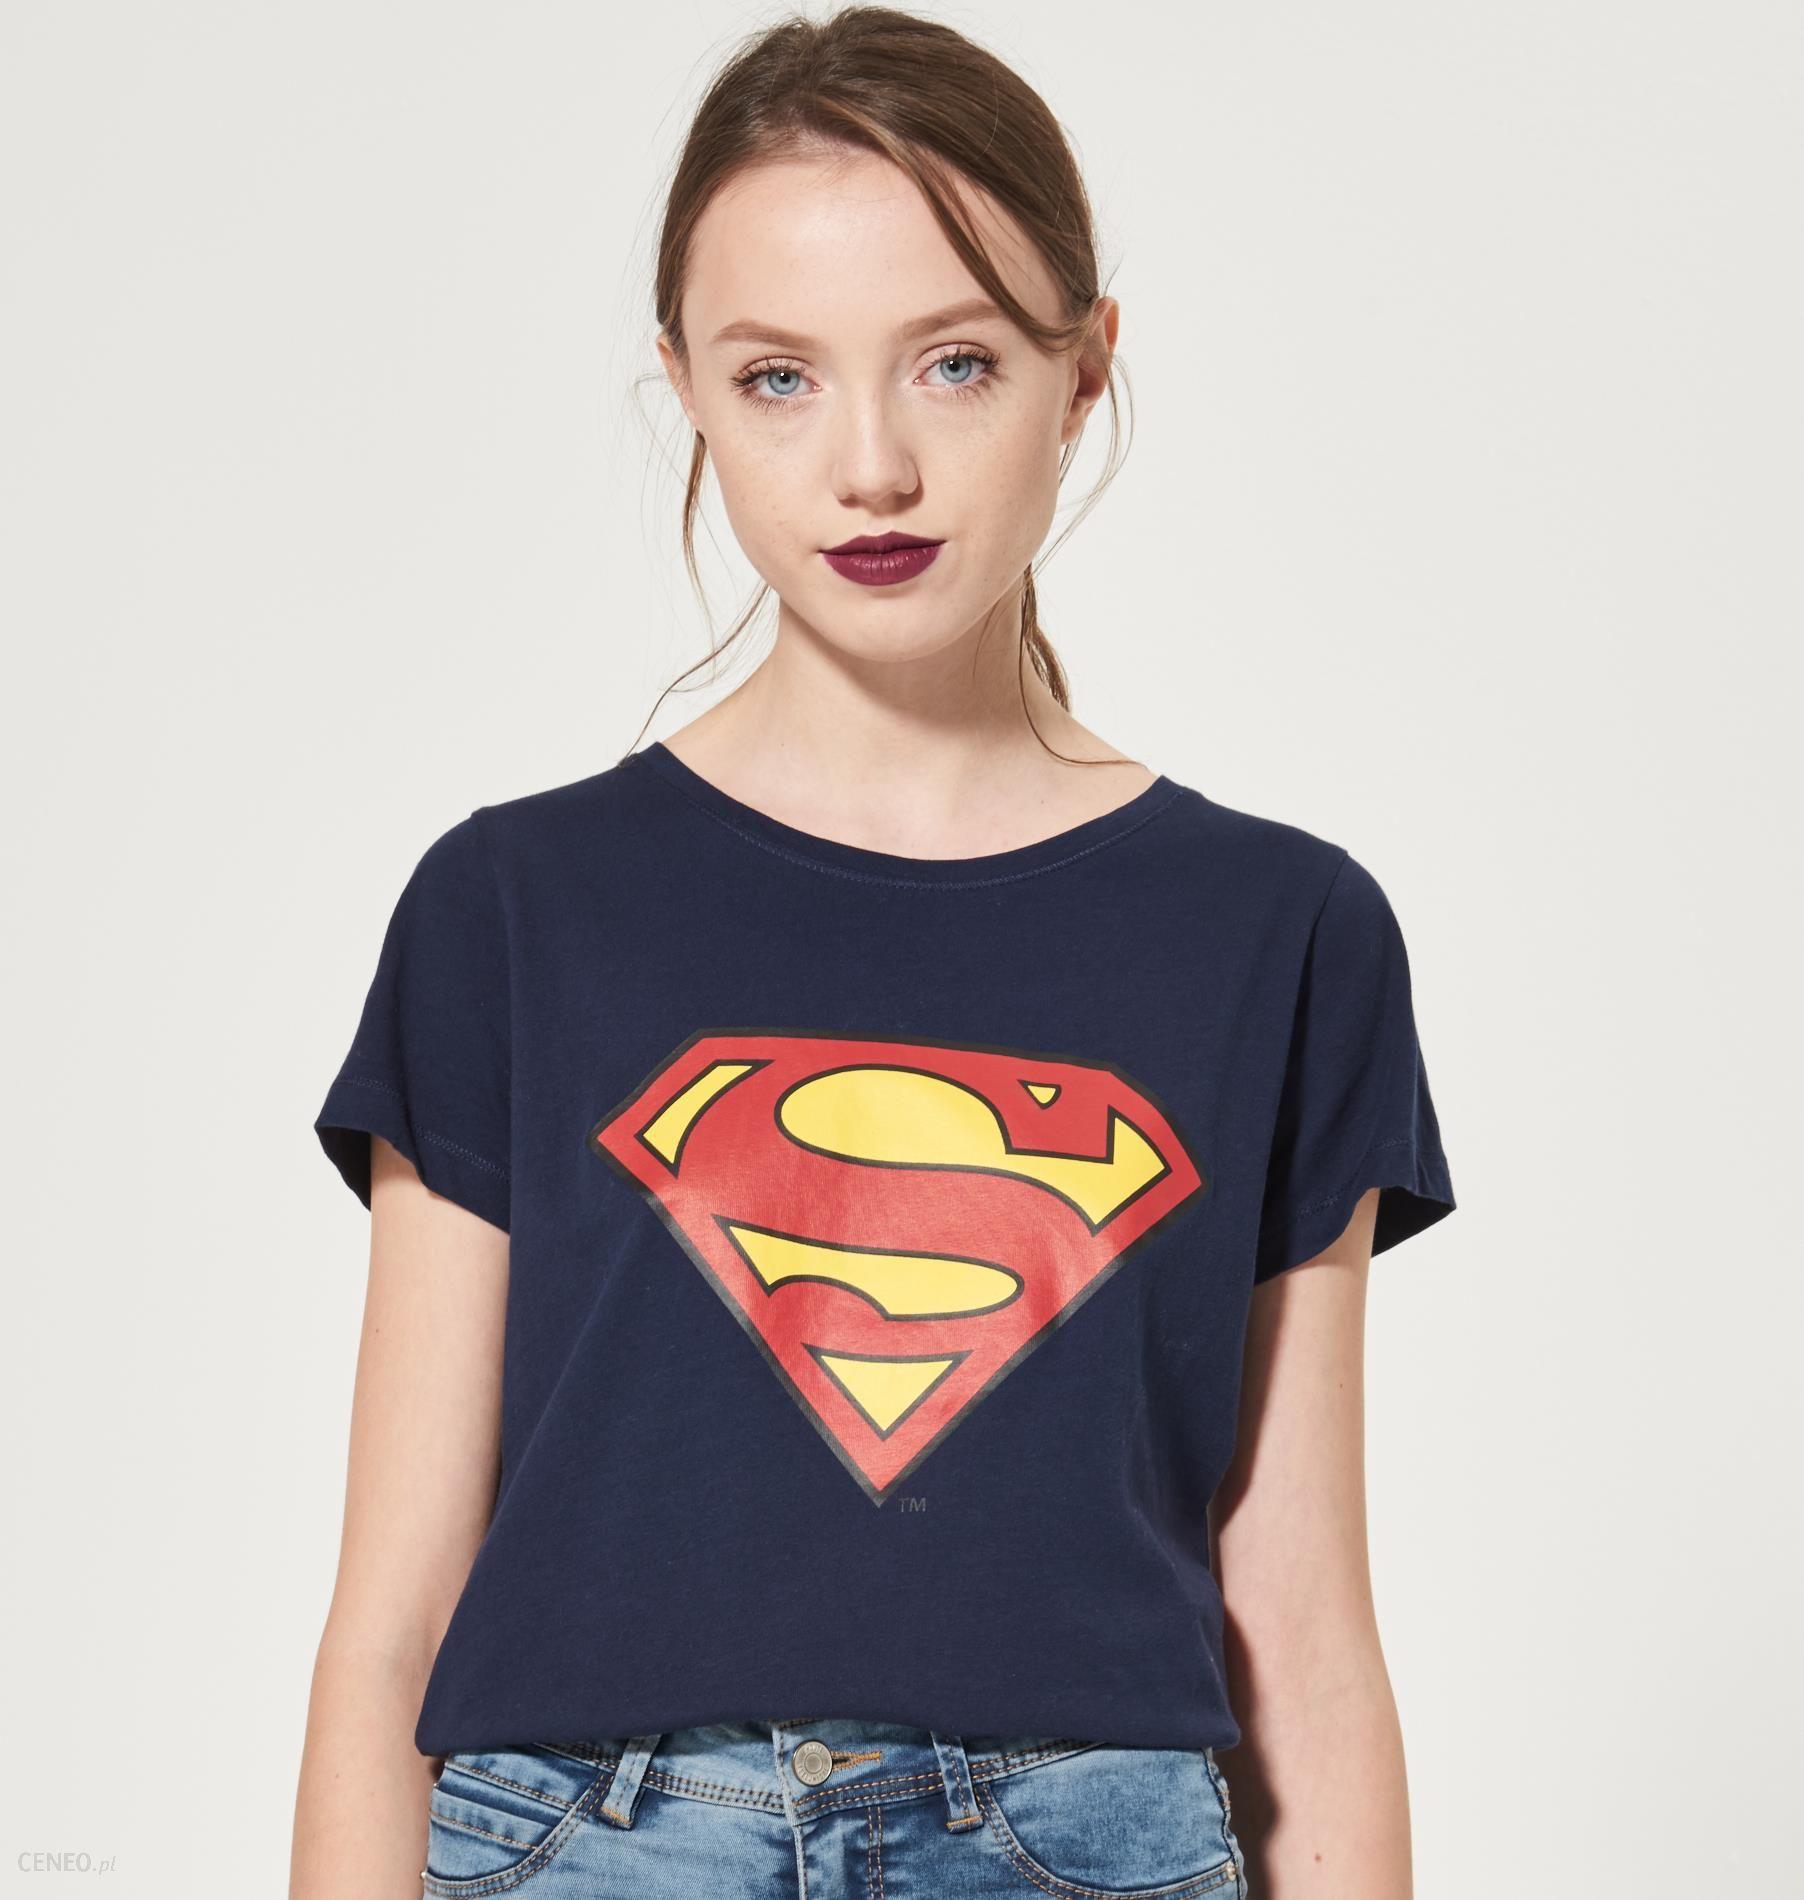 6c63fe8ac15c8d House - T-shirt superman - Granatowy - damska - Ceny i opinie - Ceneo.pl